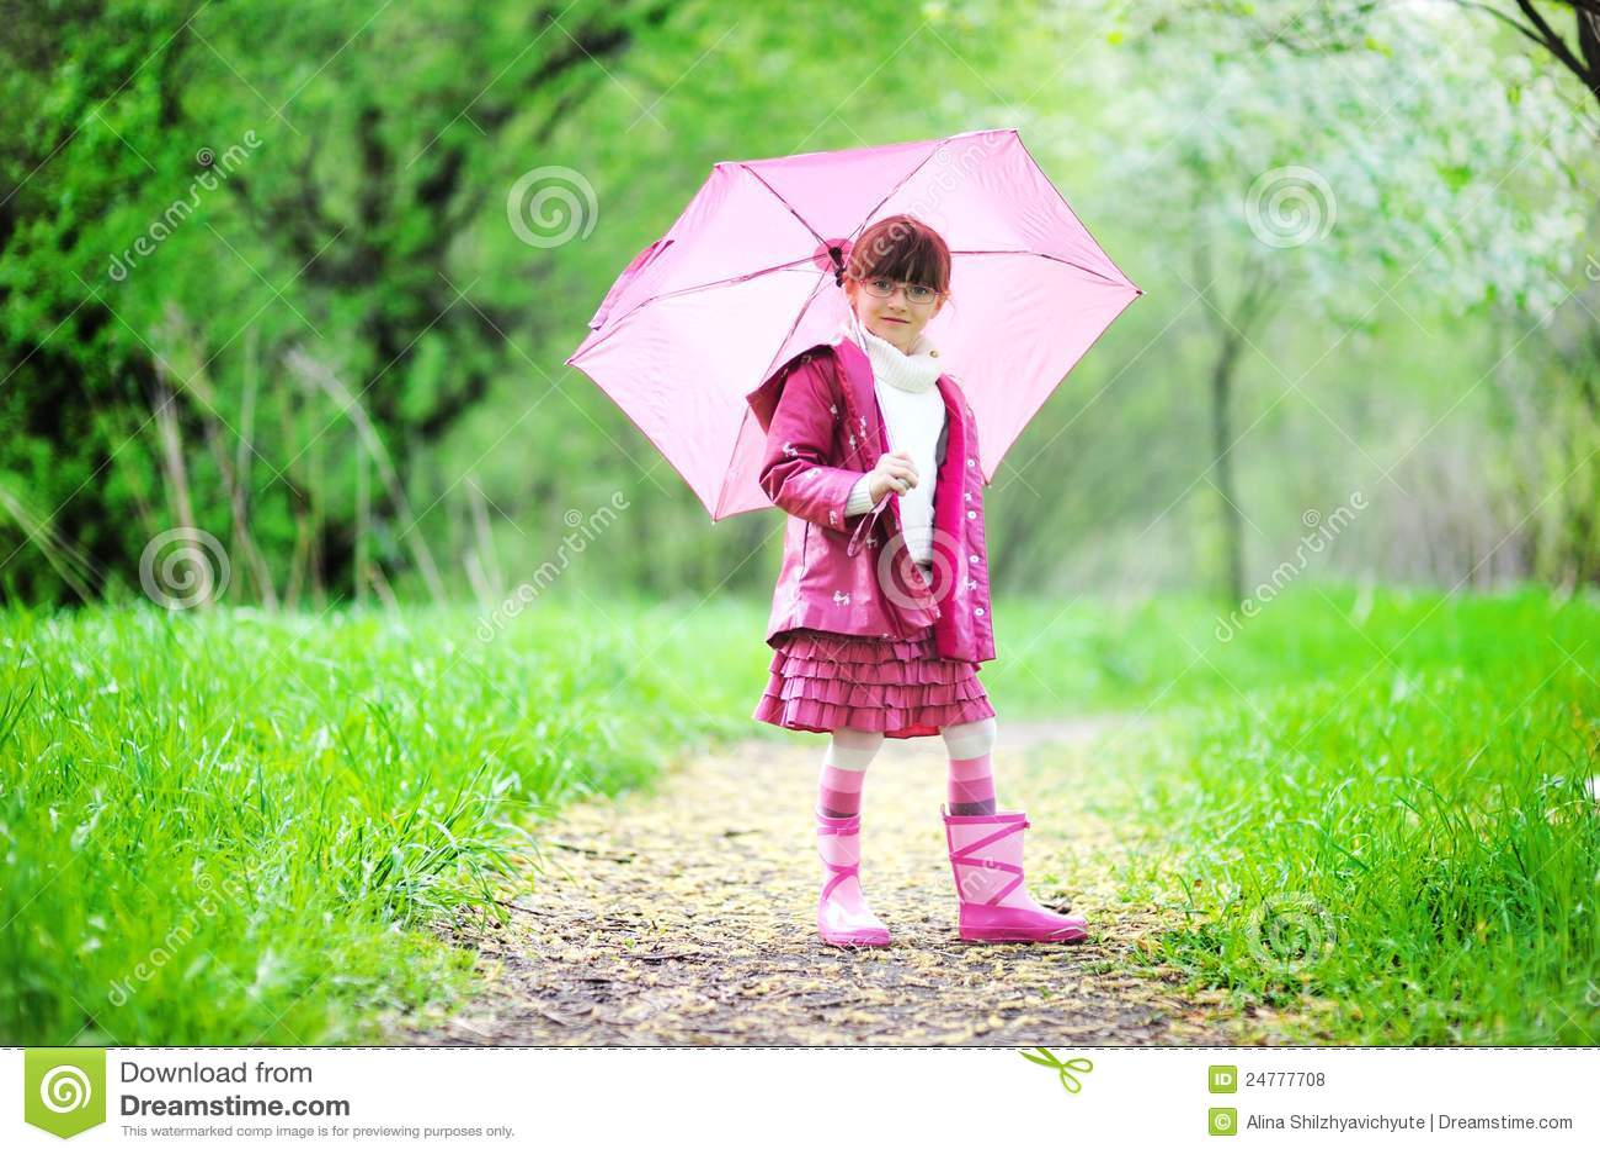 Kid girl posing outdoors with pink umbrella